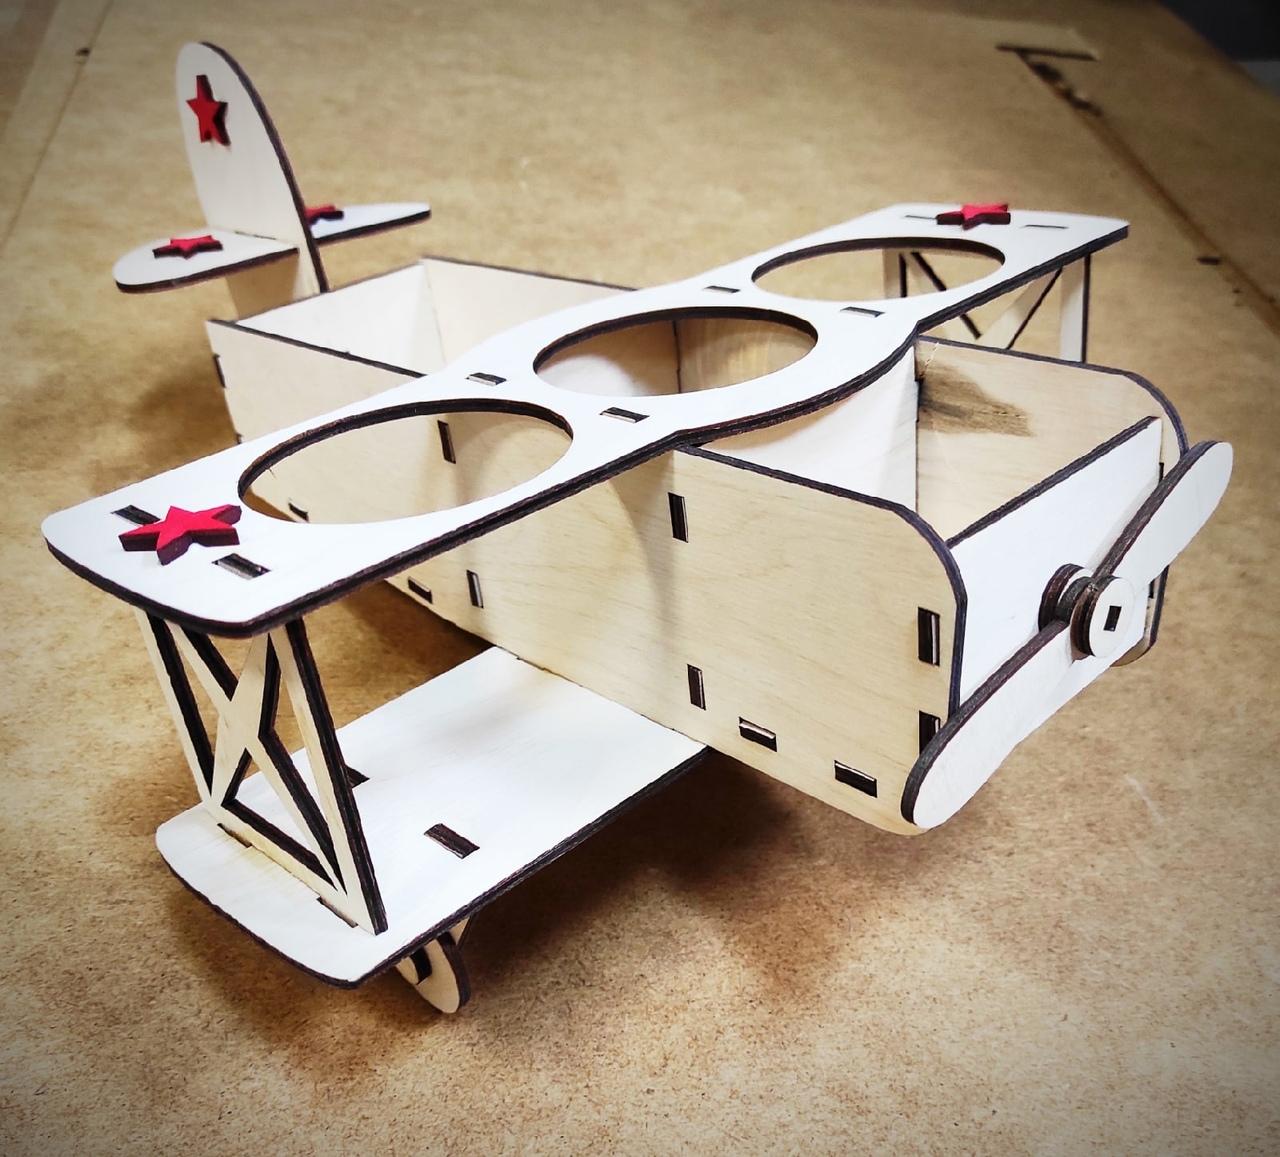 Laser Cut Airplane Model Beer Holder Free Vector